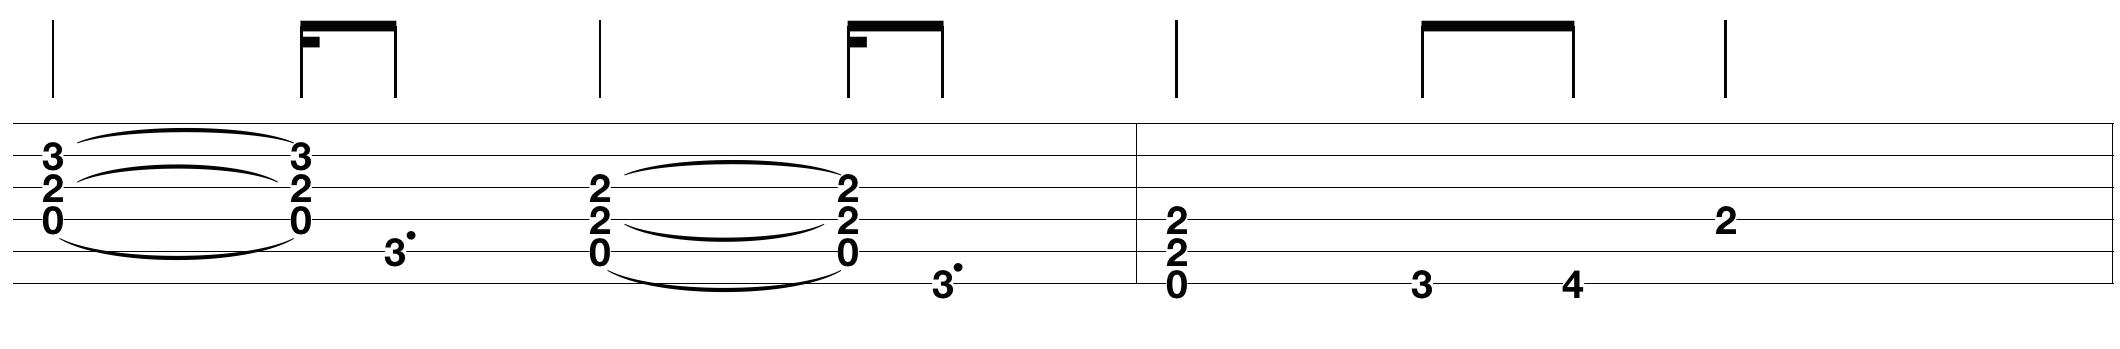 easy-rock-guitar-riffs_2.png